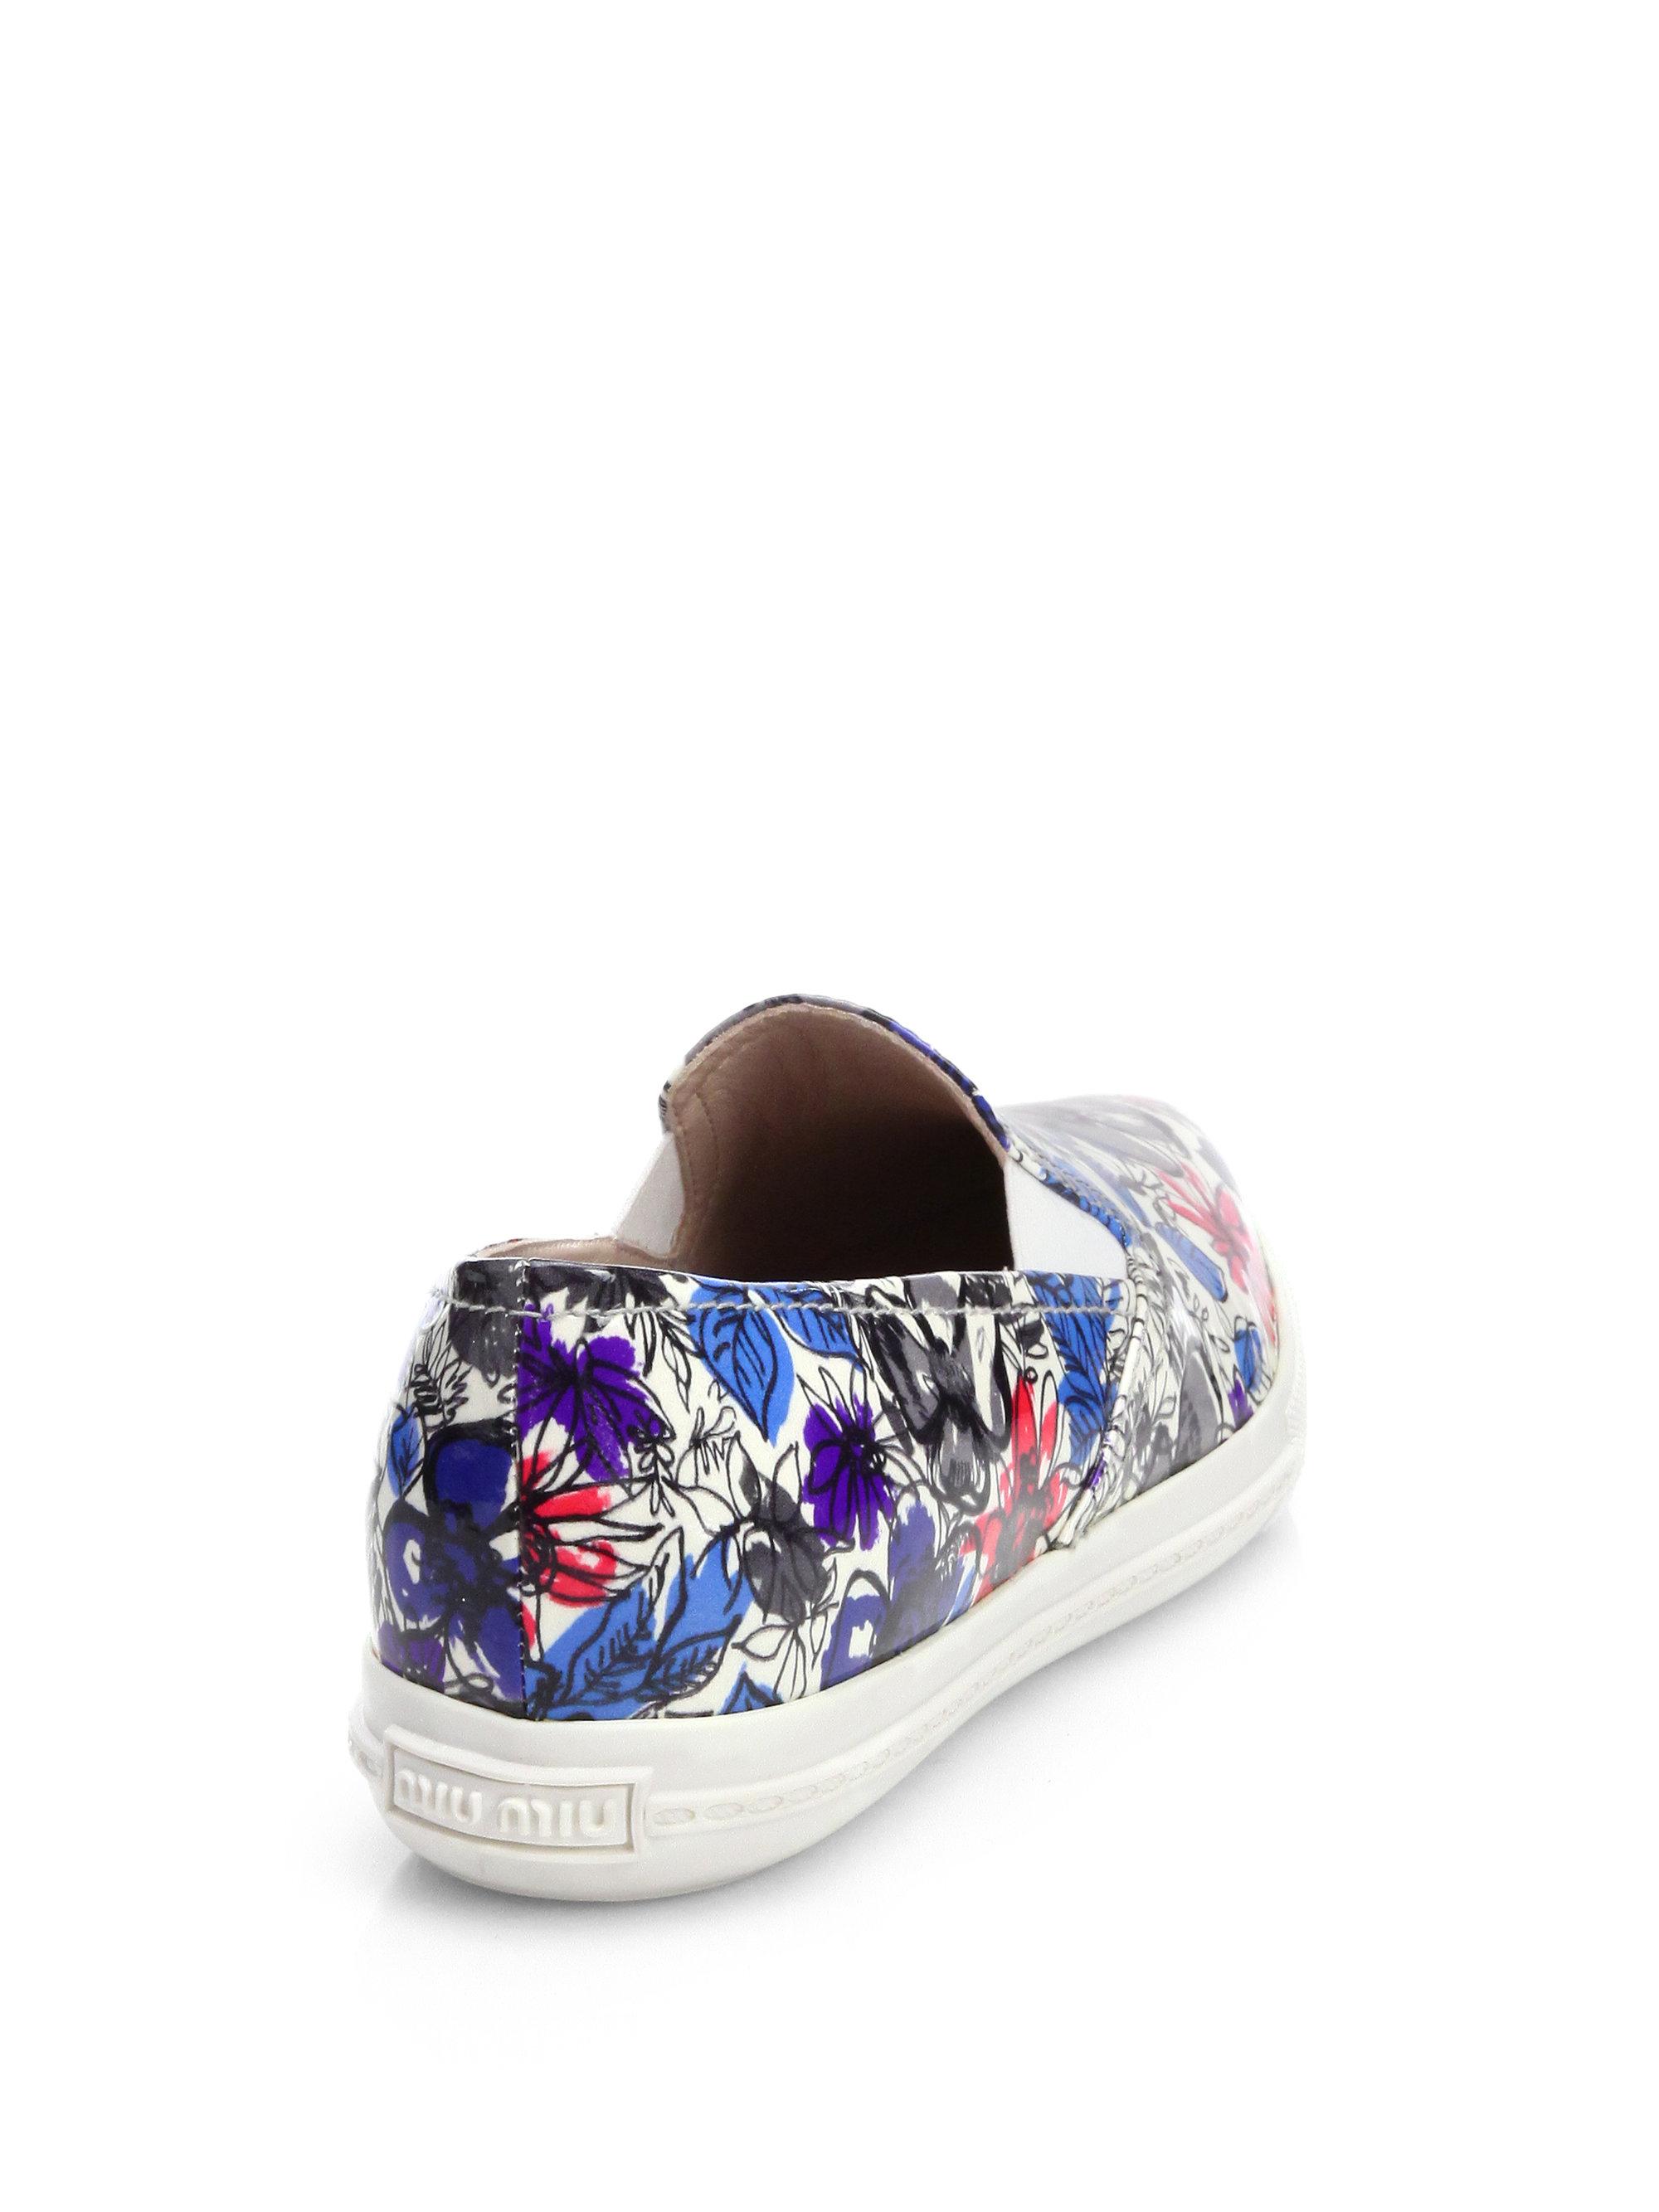 Miu Miu Floral Slip-On Sneakers cheap recommend buy cheap supply V4nlS